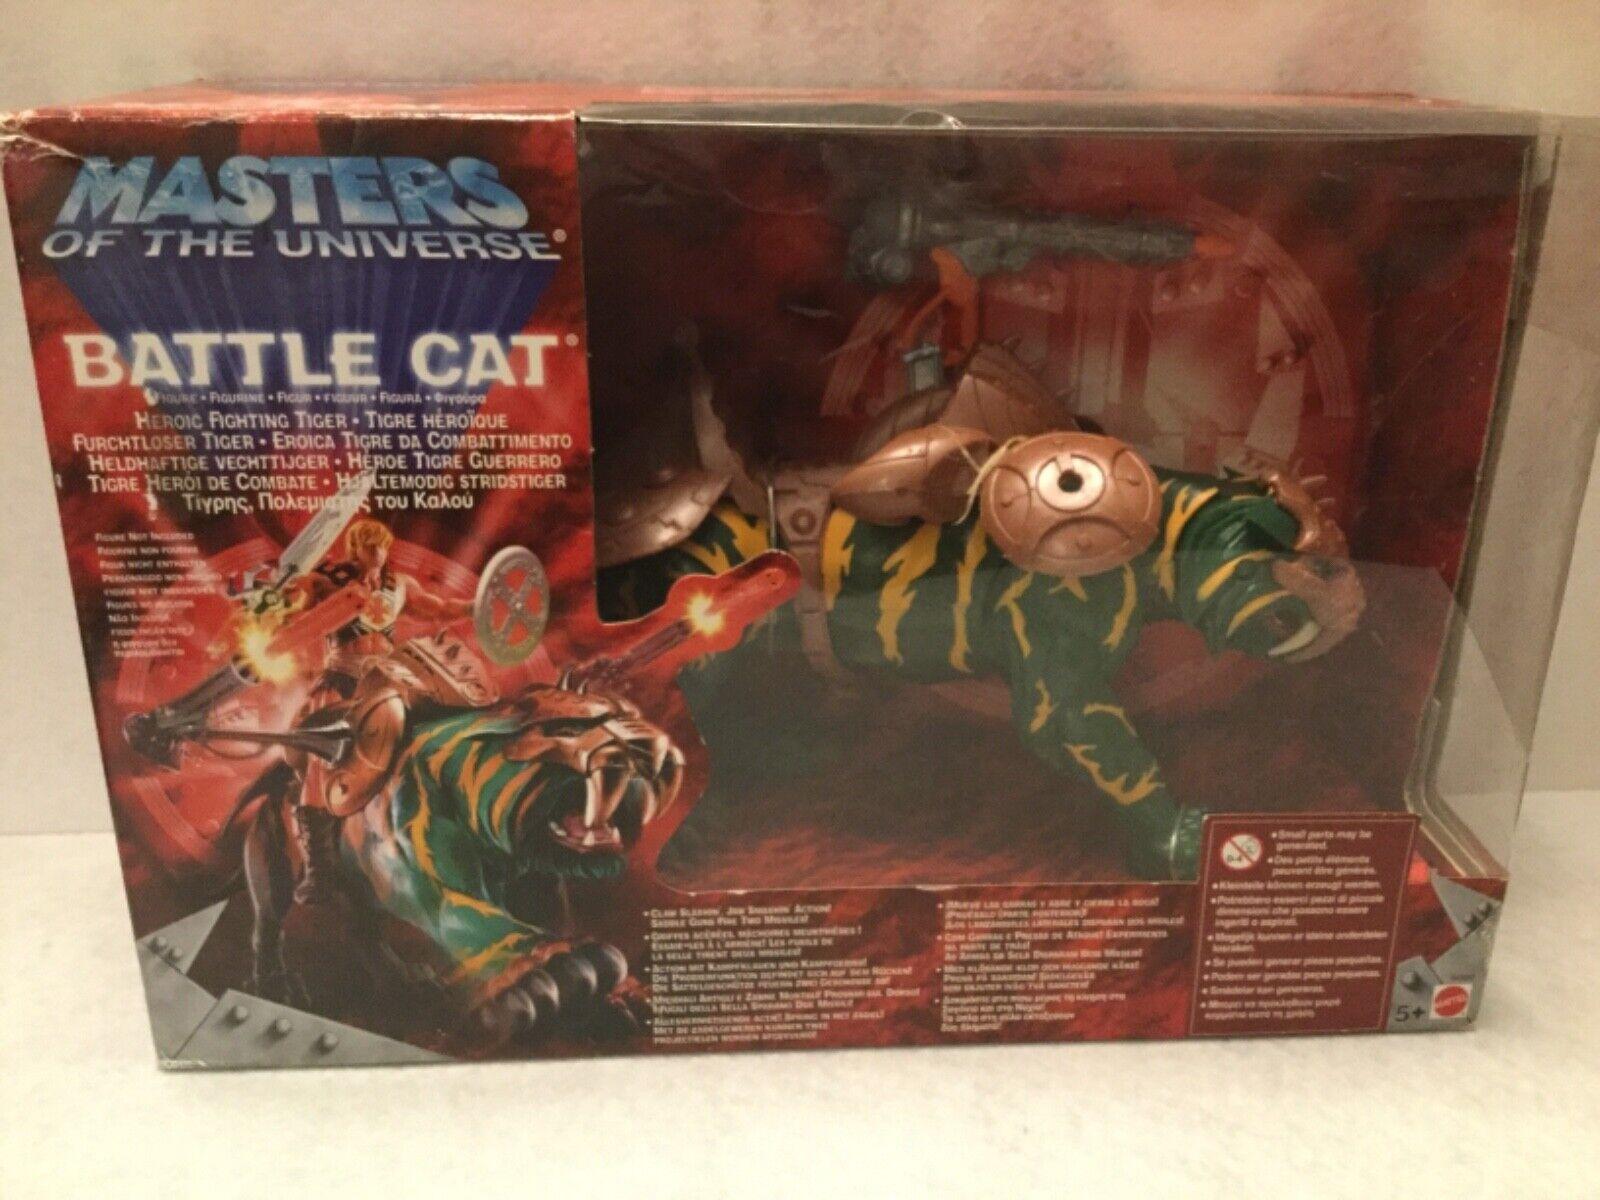 BATTLE CAT. MÁSTERS OF THE UNIVERSE. MATTEL. 2002